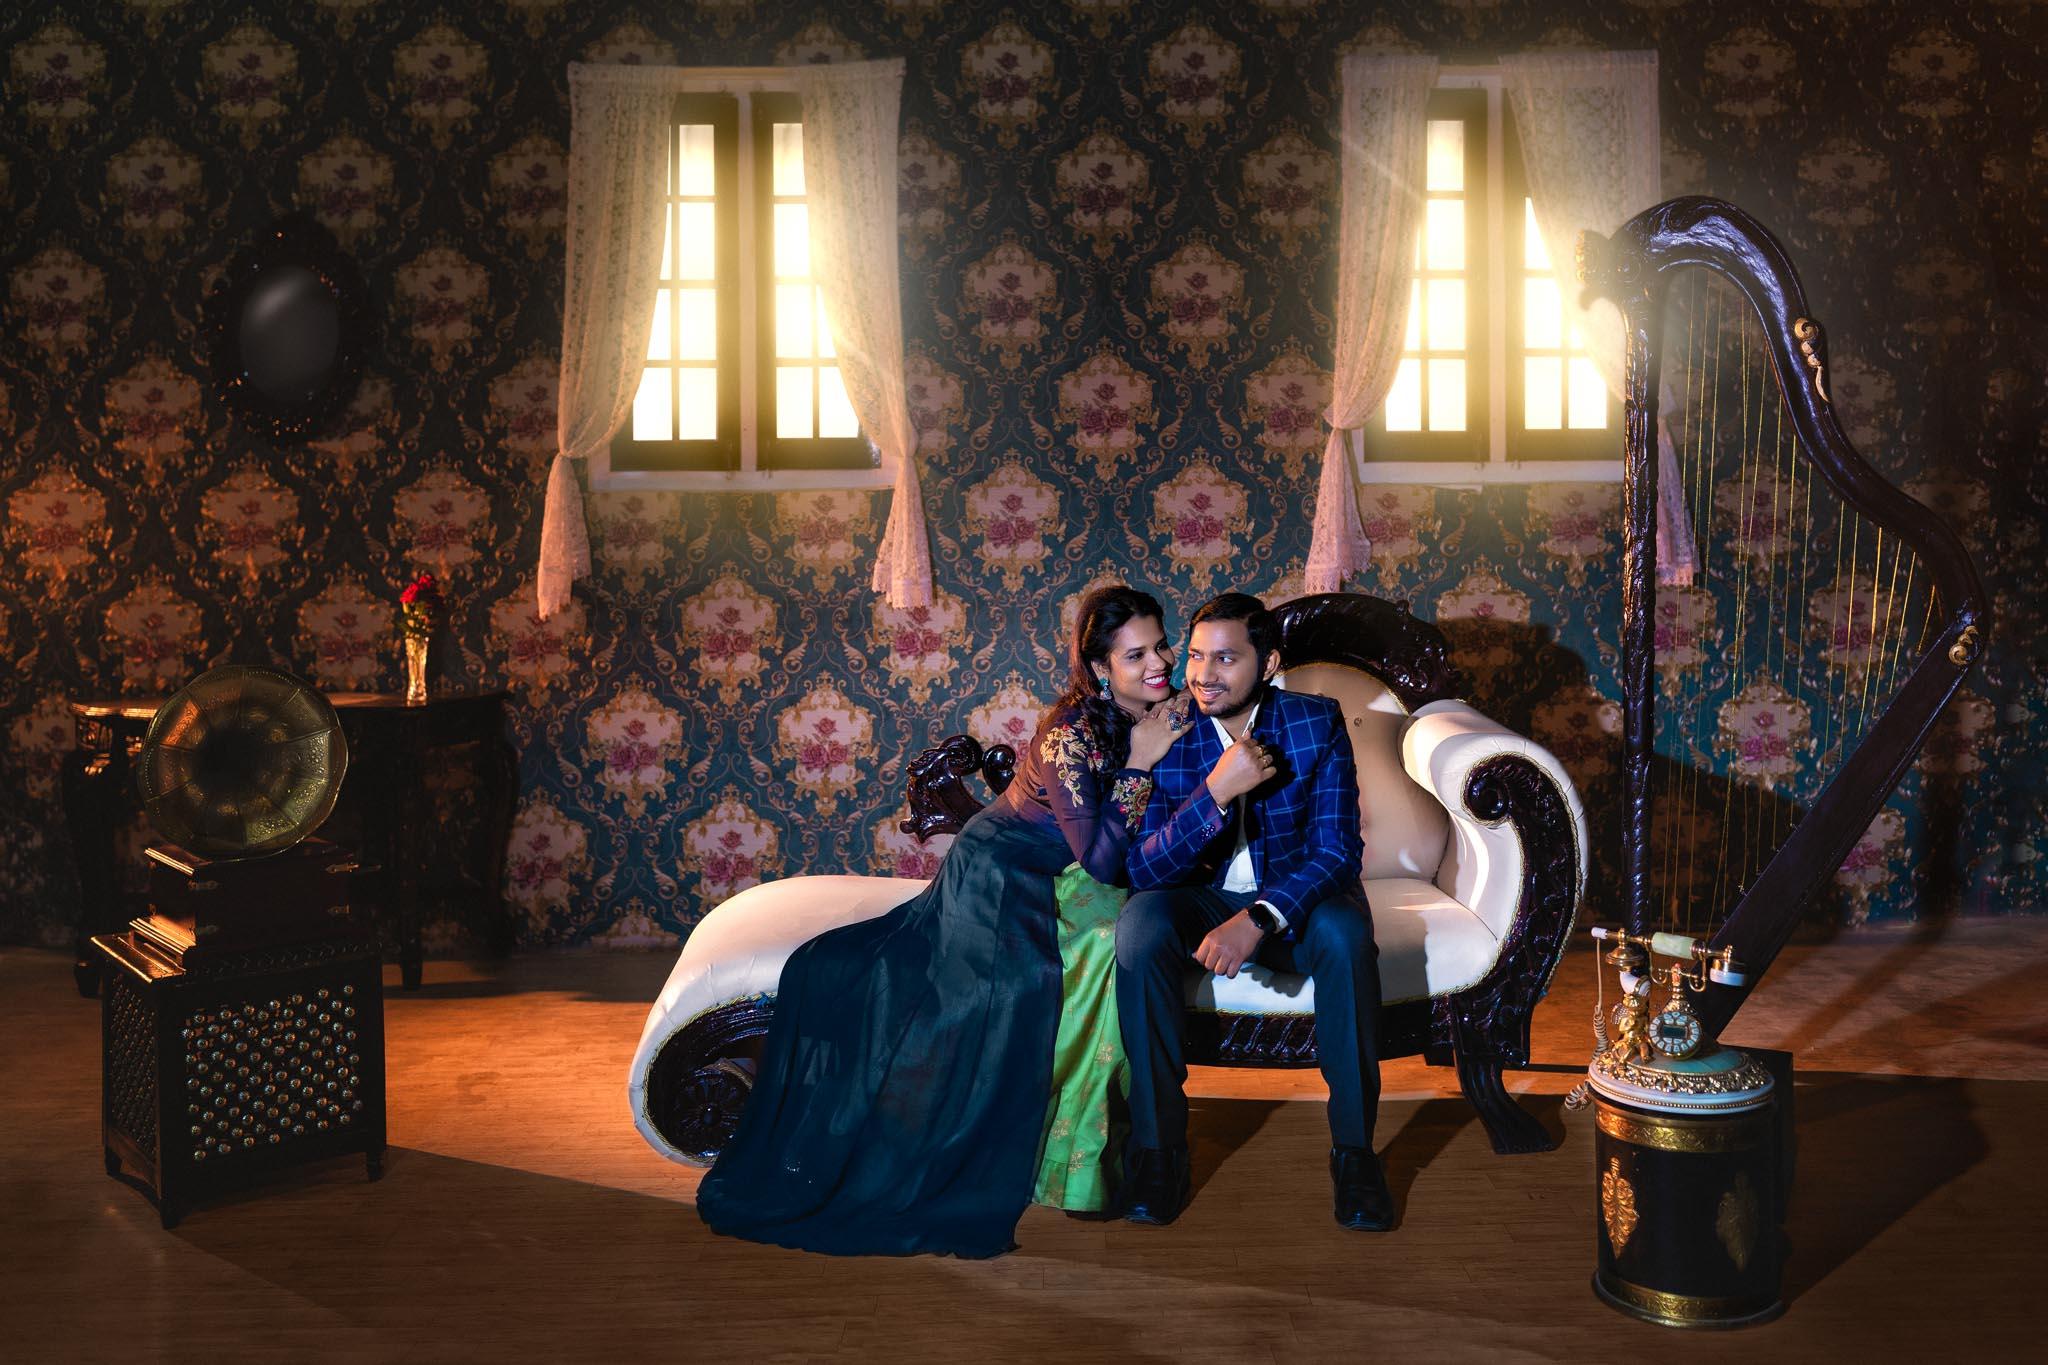 Best-of-2018-wedding-photography-focuz-studios-72